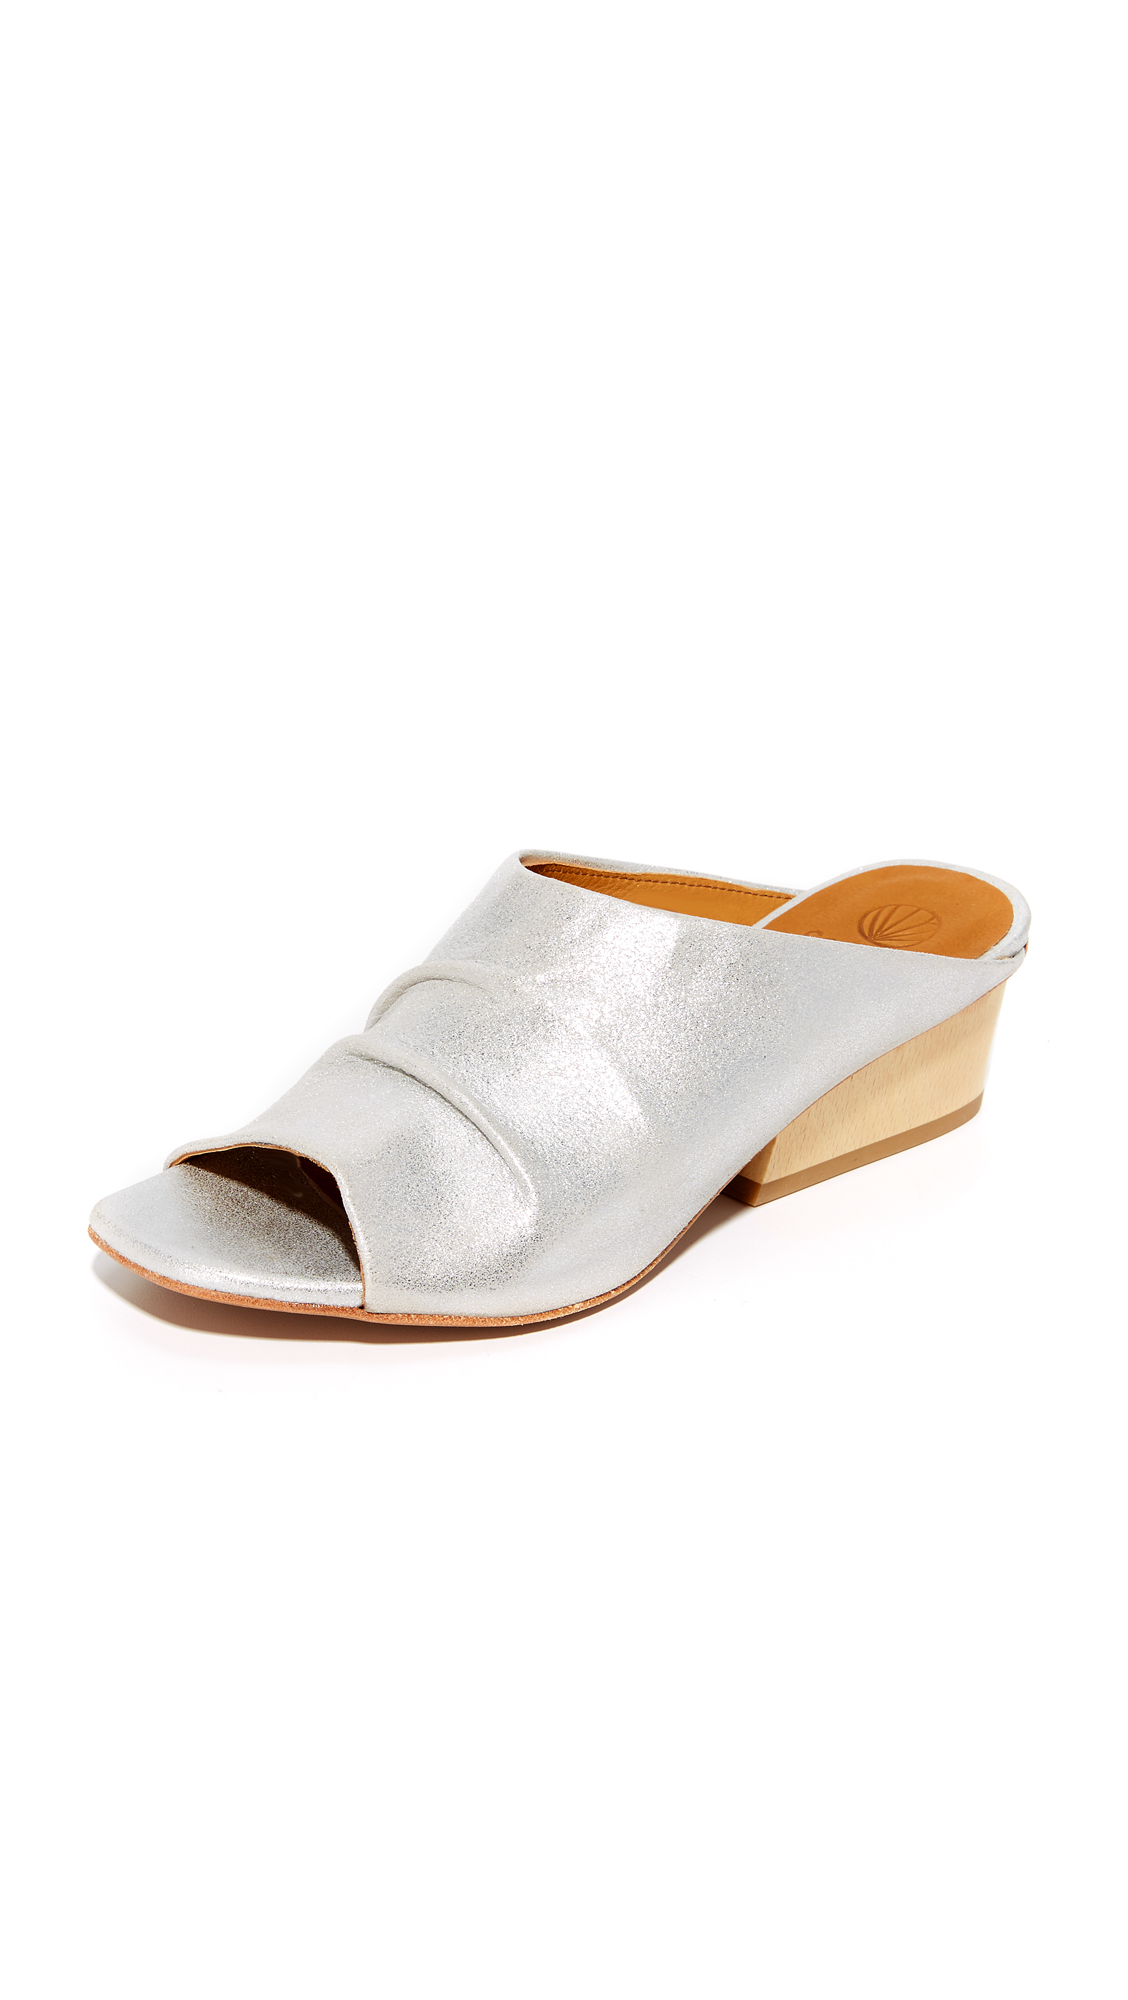 Coclico Shoes Oahu Mules - Plata/Natural at Shopbop